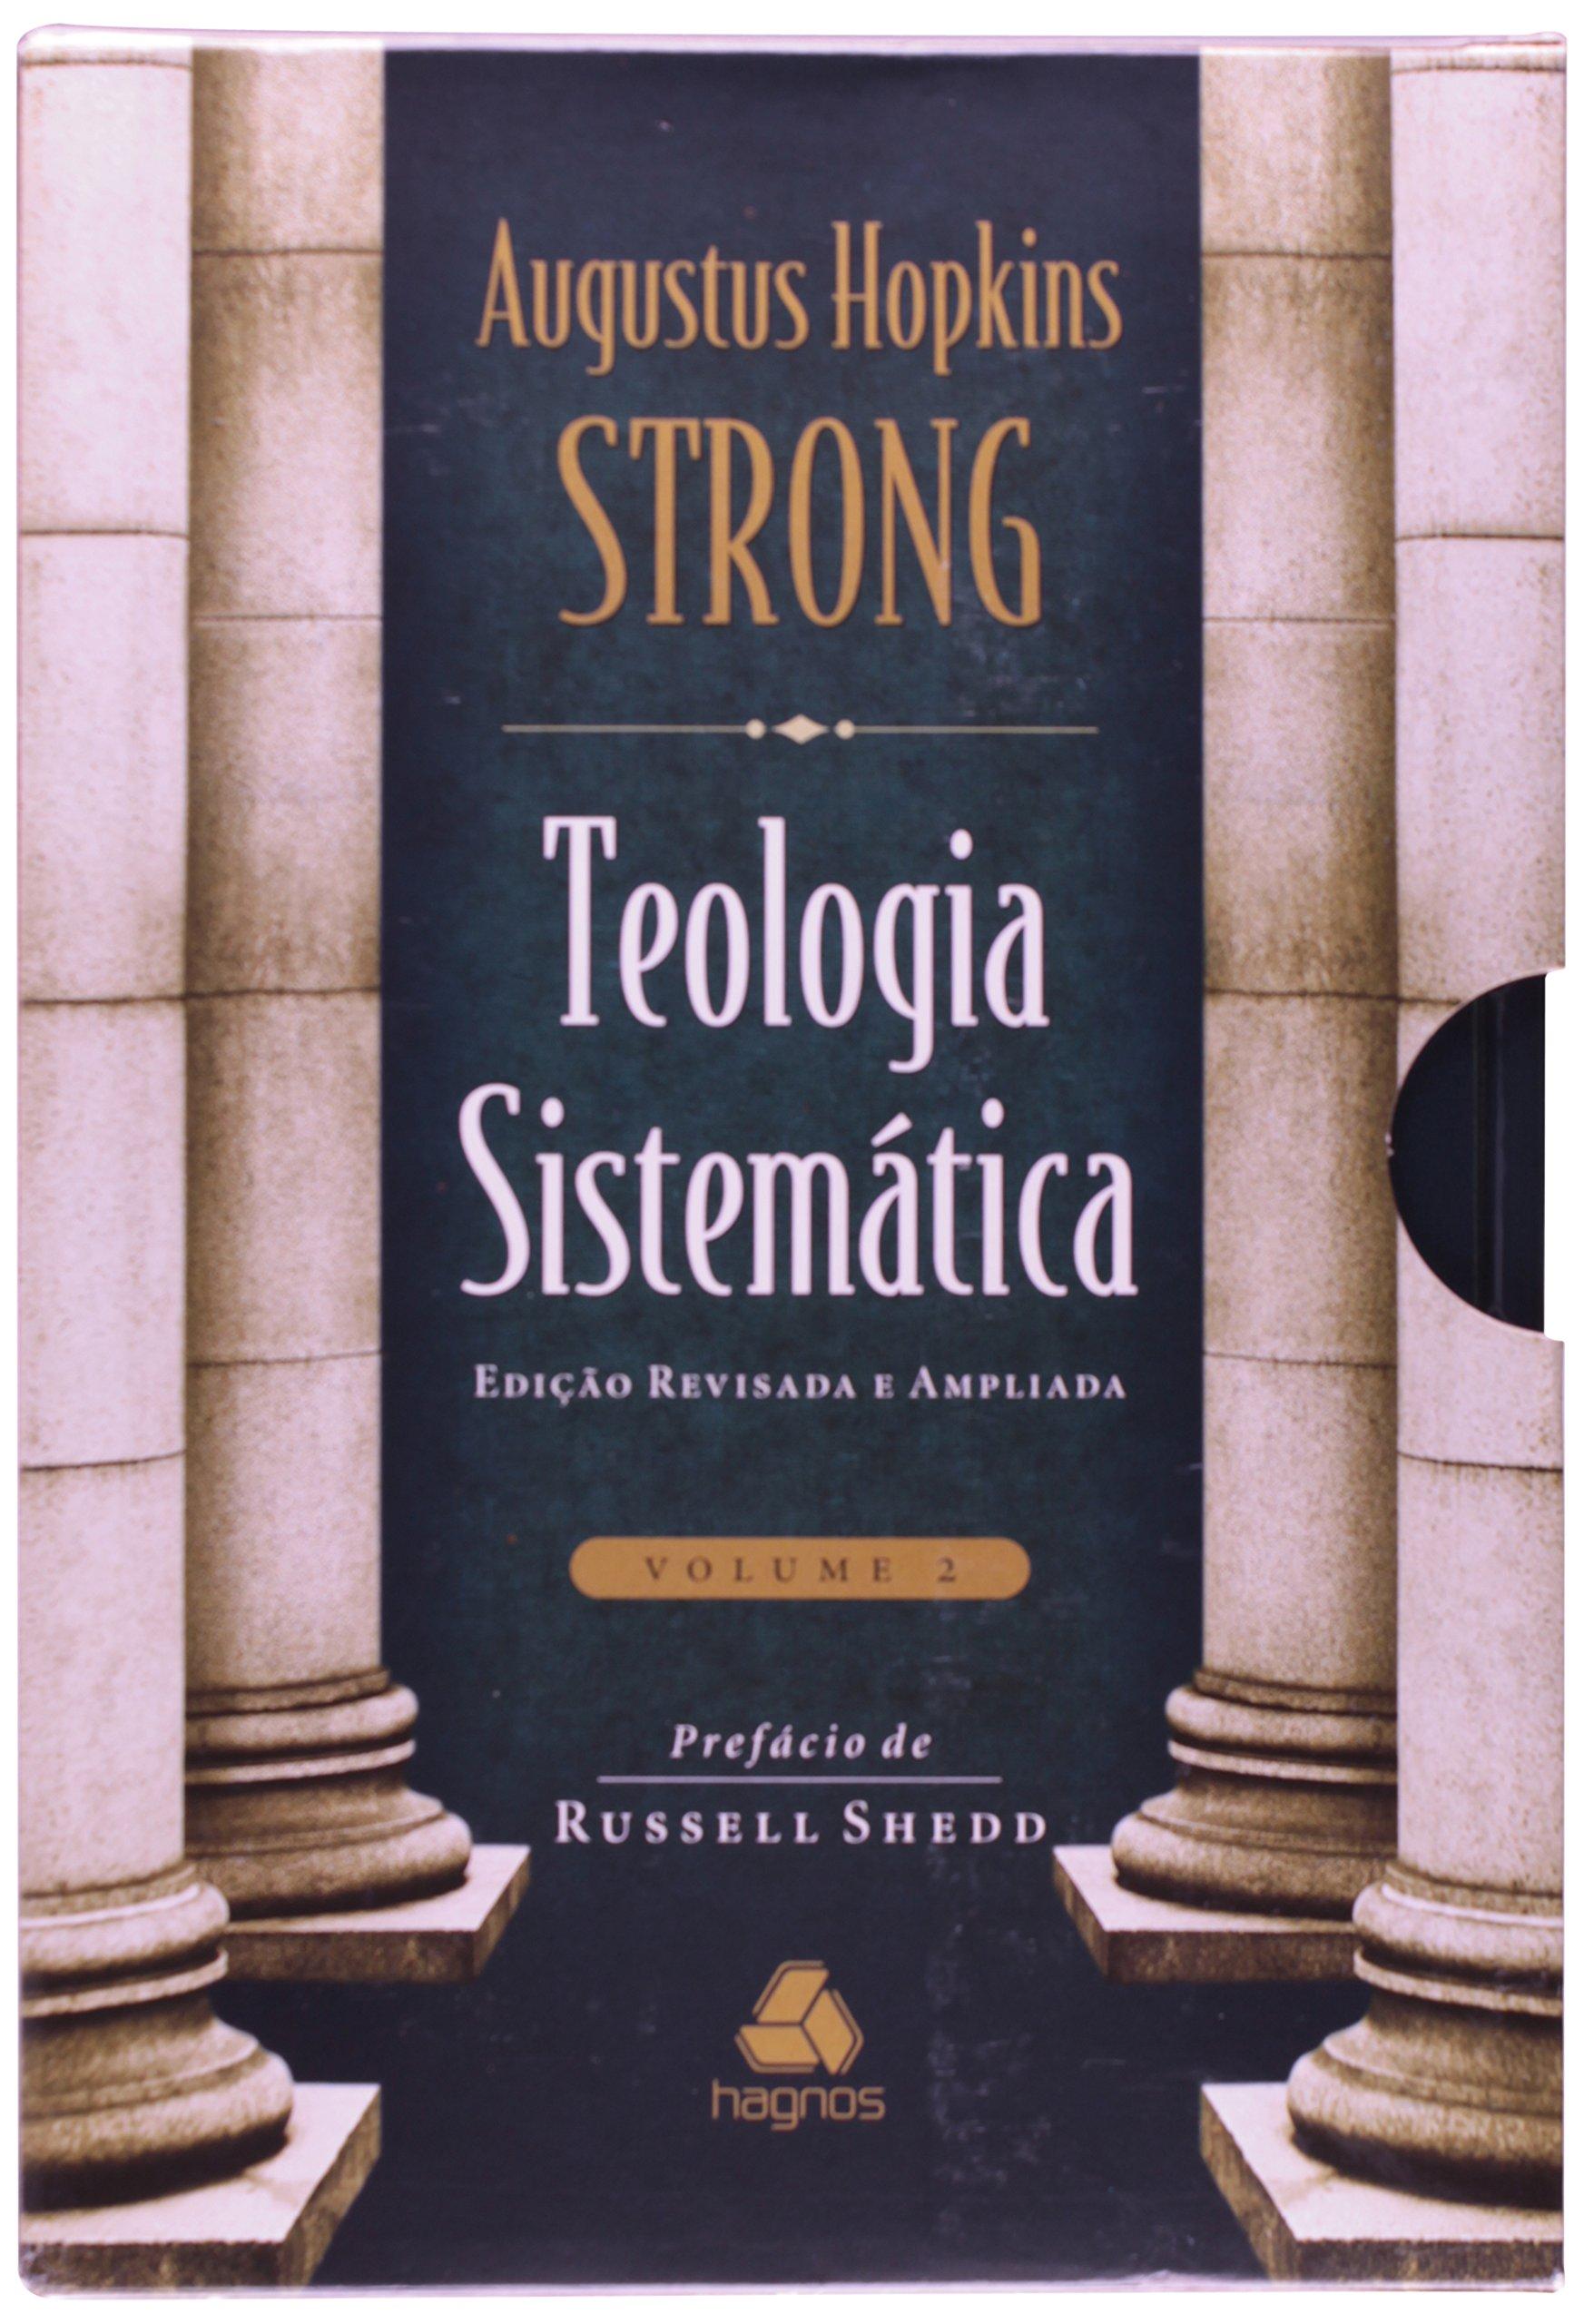 Teologia sistem tica de strong 2 volumes 9788577420094 livros na amazon brasil